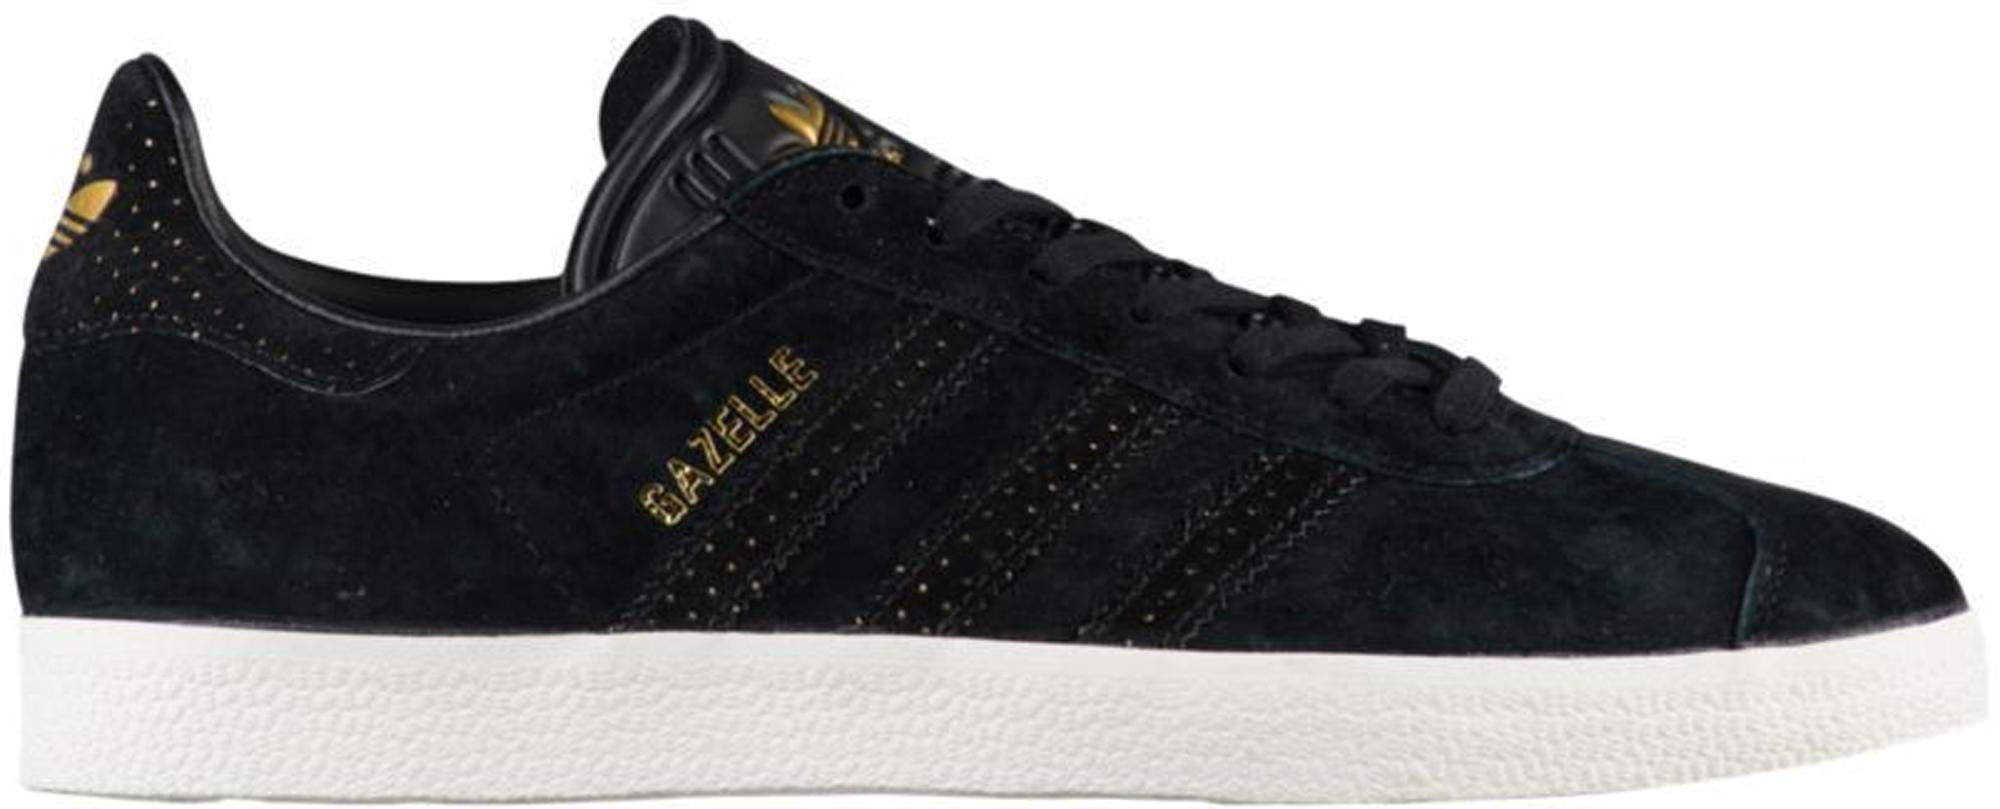 adidas Gazelle Core Black Gold Metallic